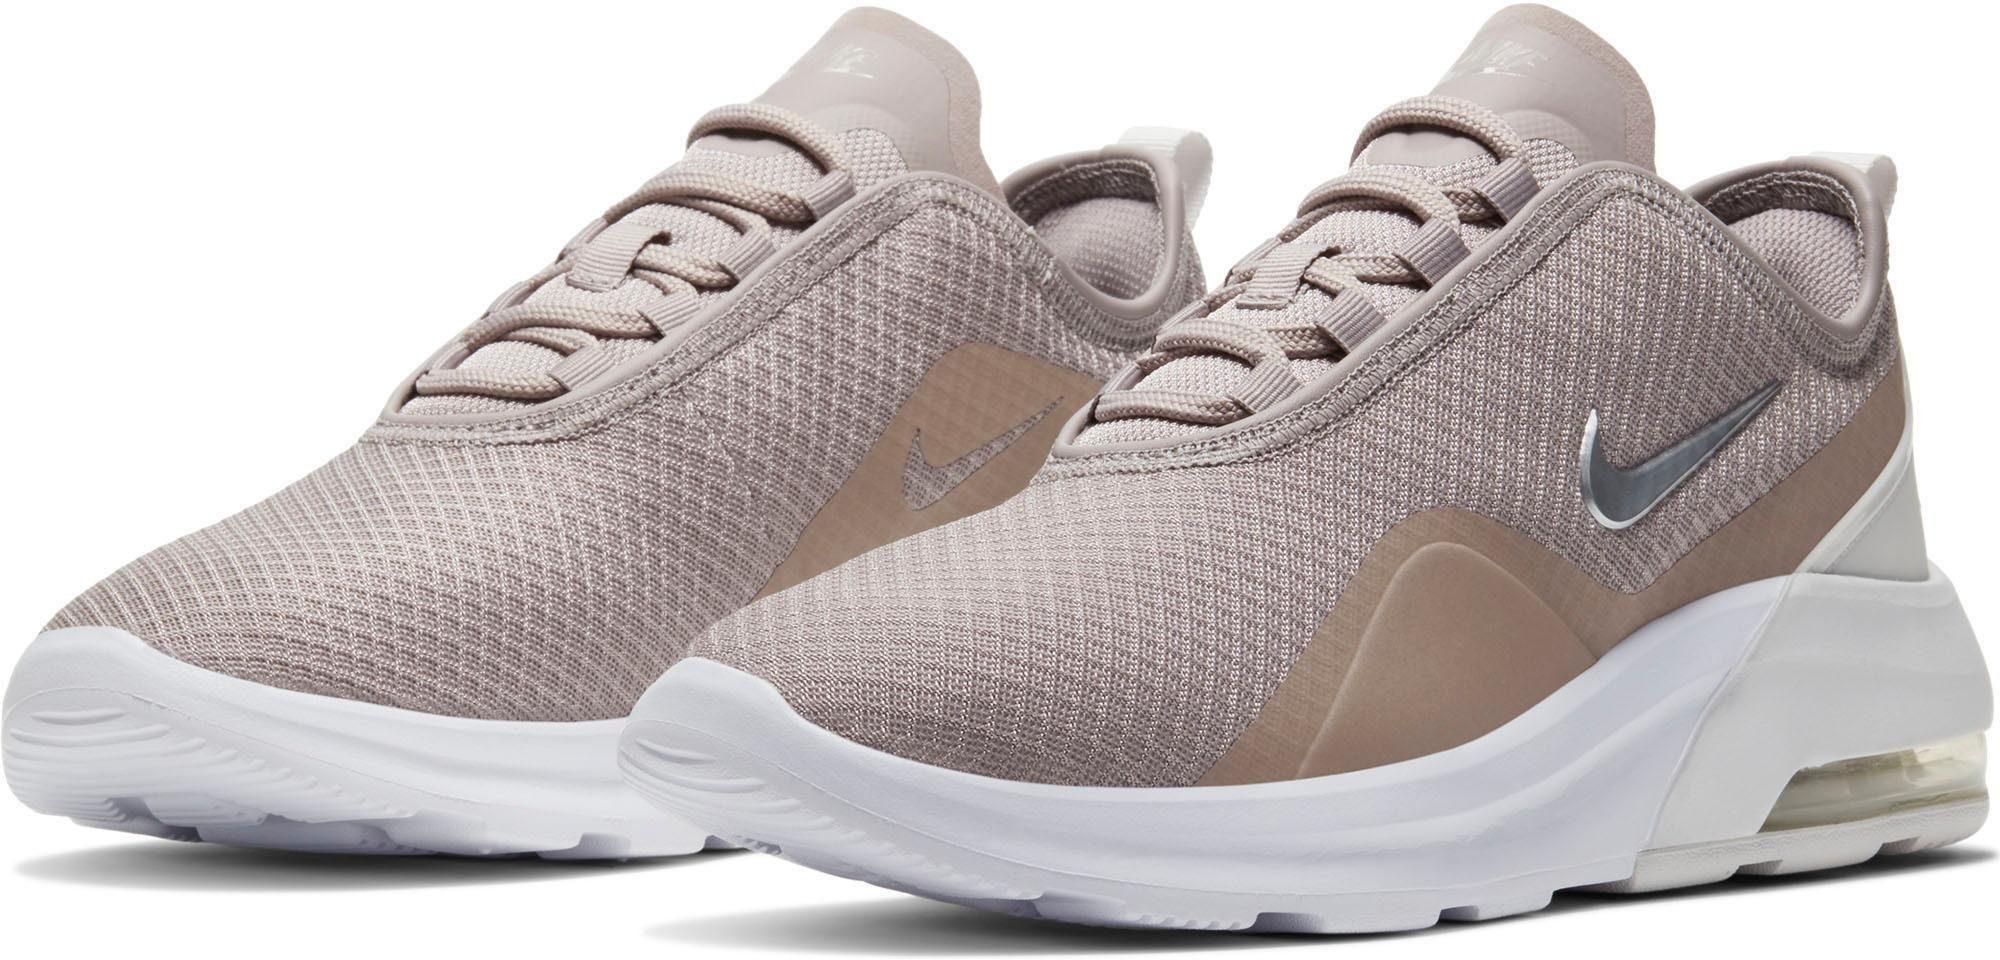 Nike Sportswear »Wmns Air Max Motion 2« Sneaker, Atmungsaktives Obermaterial aus Synthetik und Textil online kaufen | OTTO